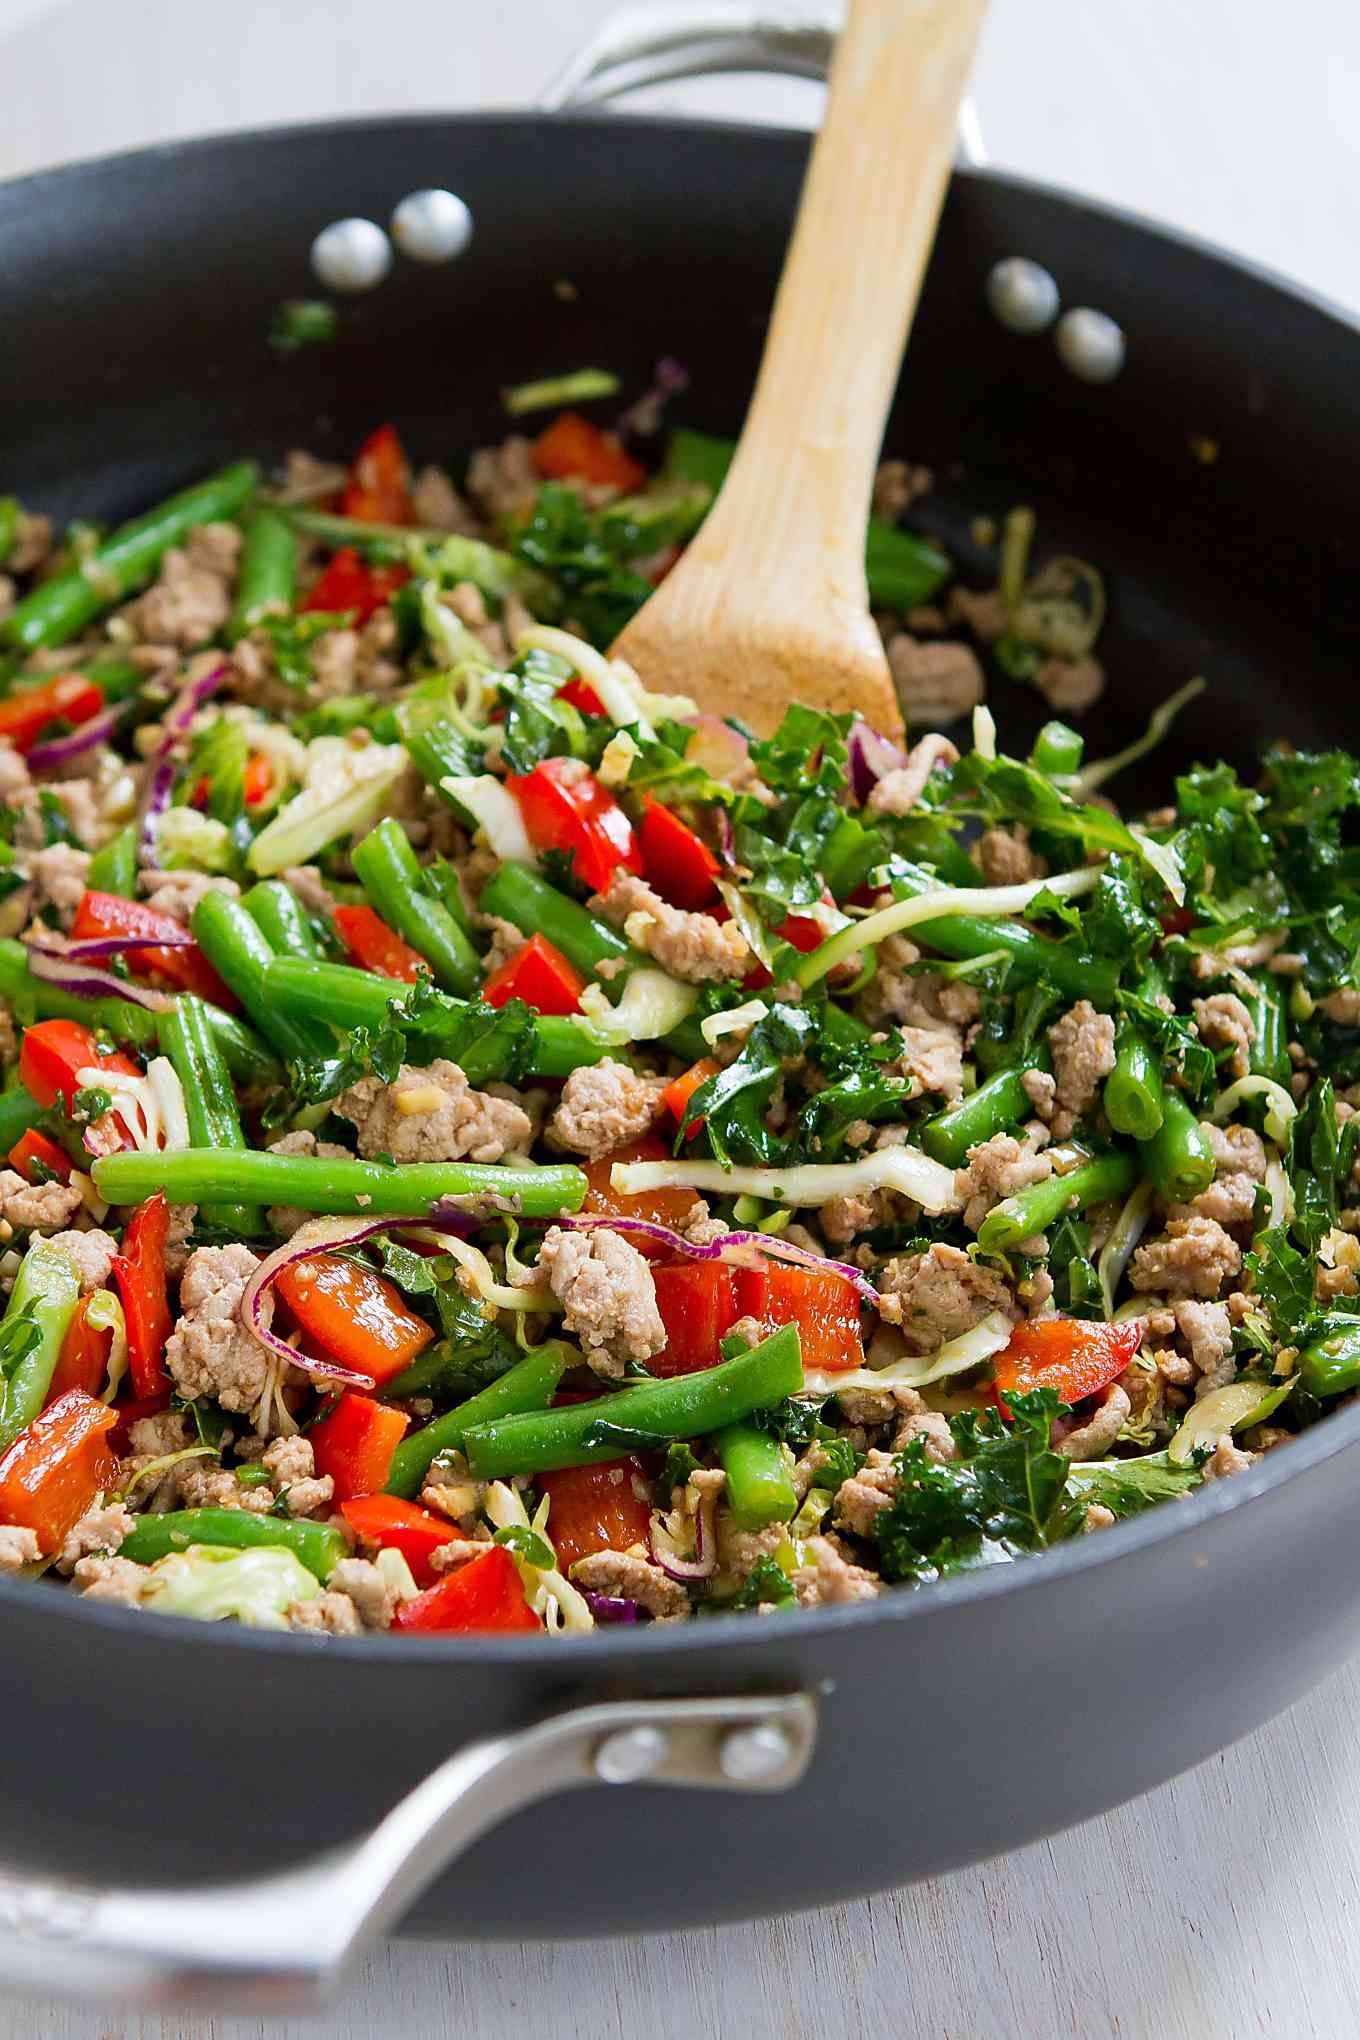 Ground Turkey Stir Fry With Greens Beans Kale Recipe Healthy